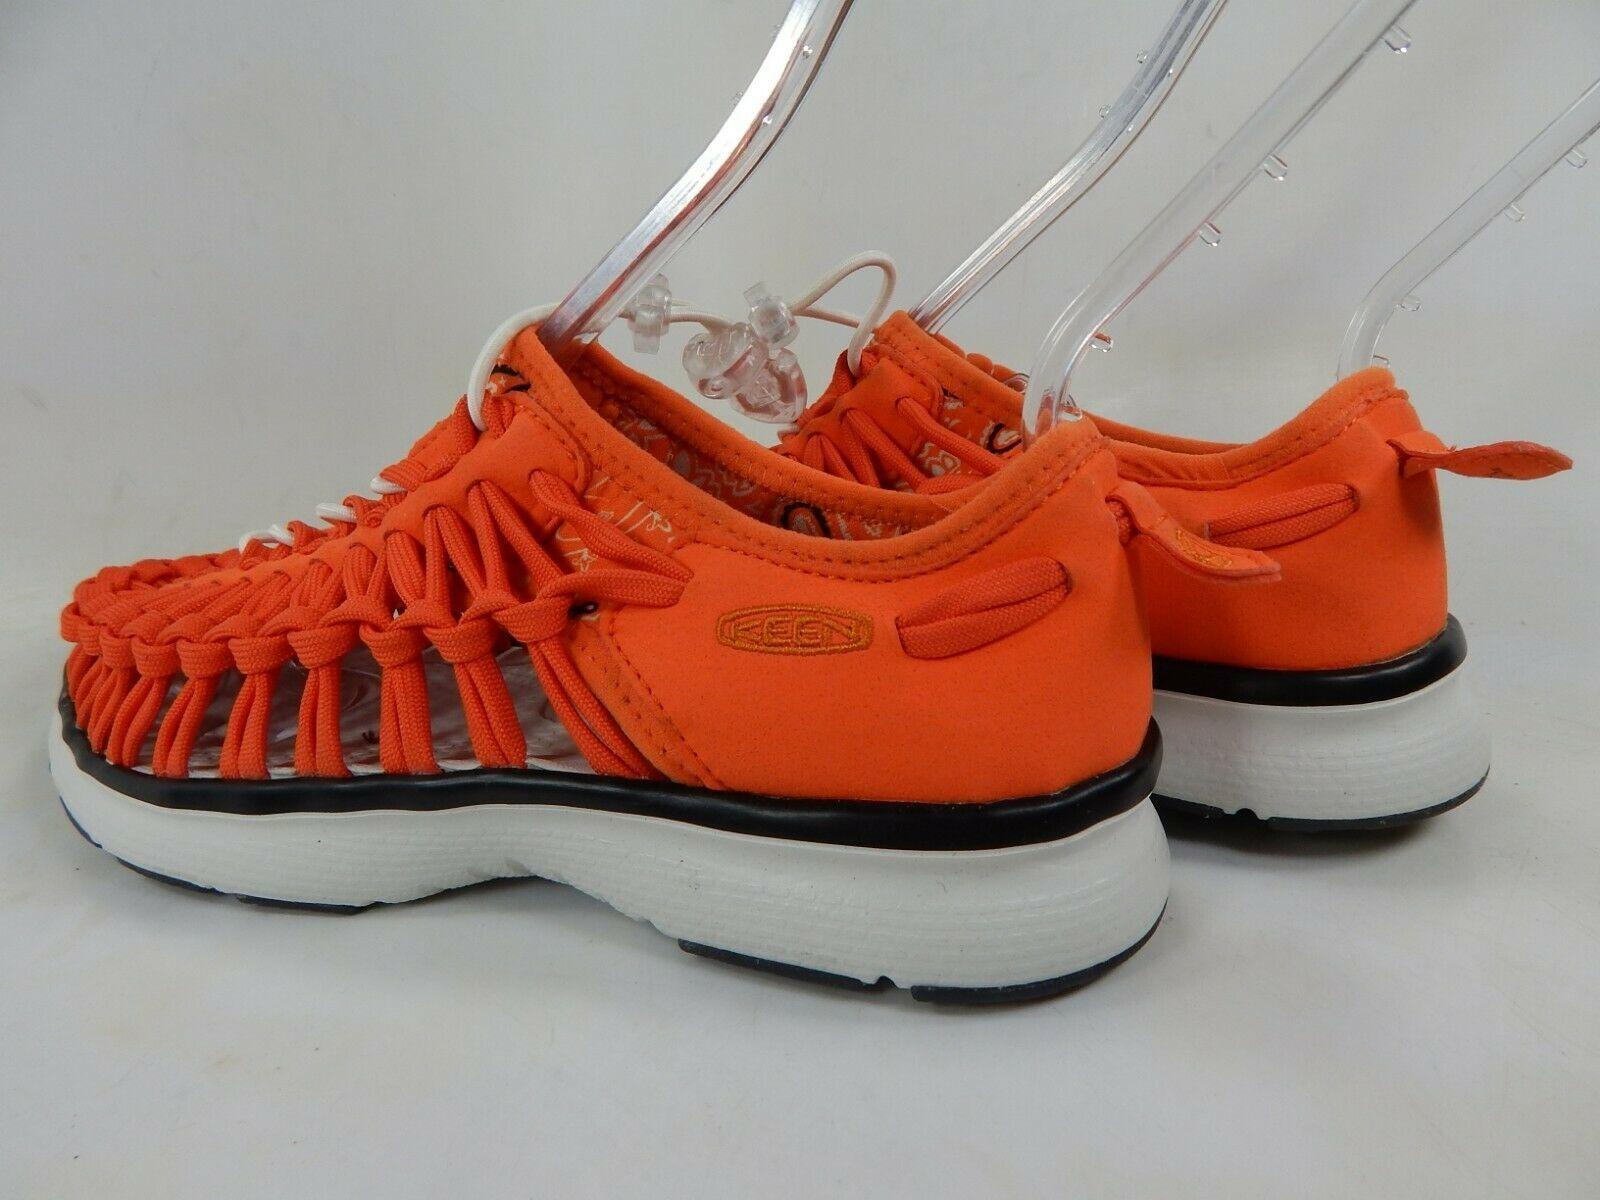 Keen Uneek O2 Talla 7M (B) Eu 37.5 Mujer Deporte Sandalias Rojo Tango / Naranja